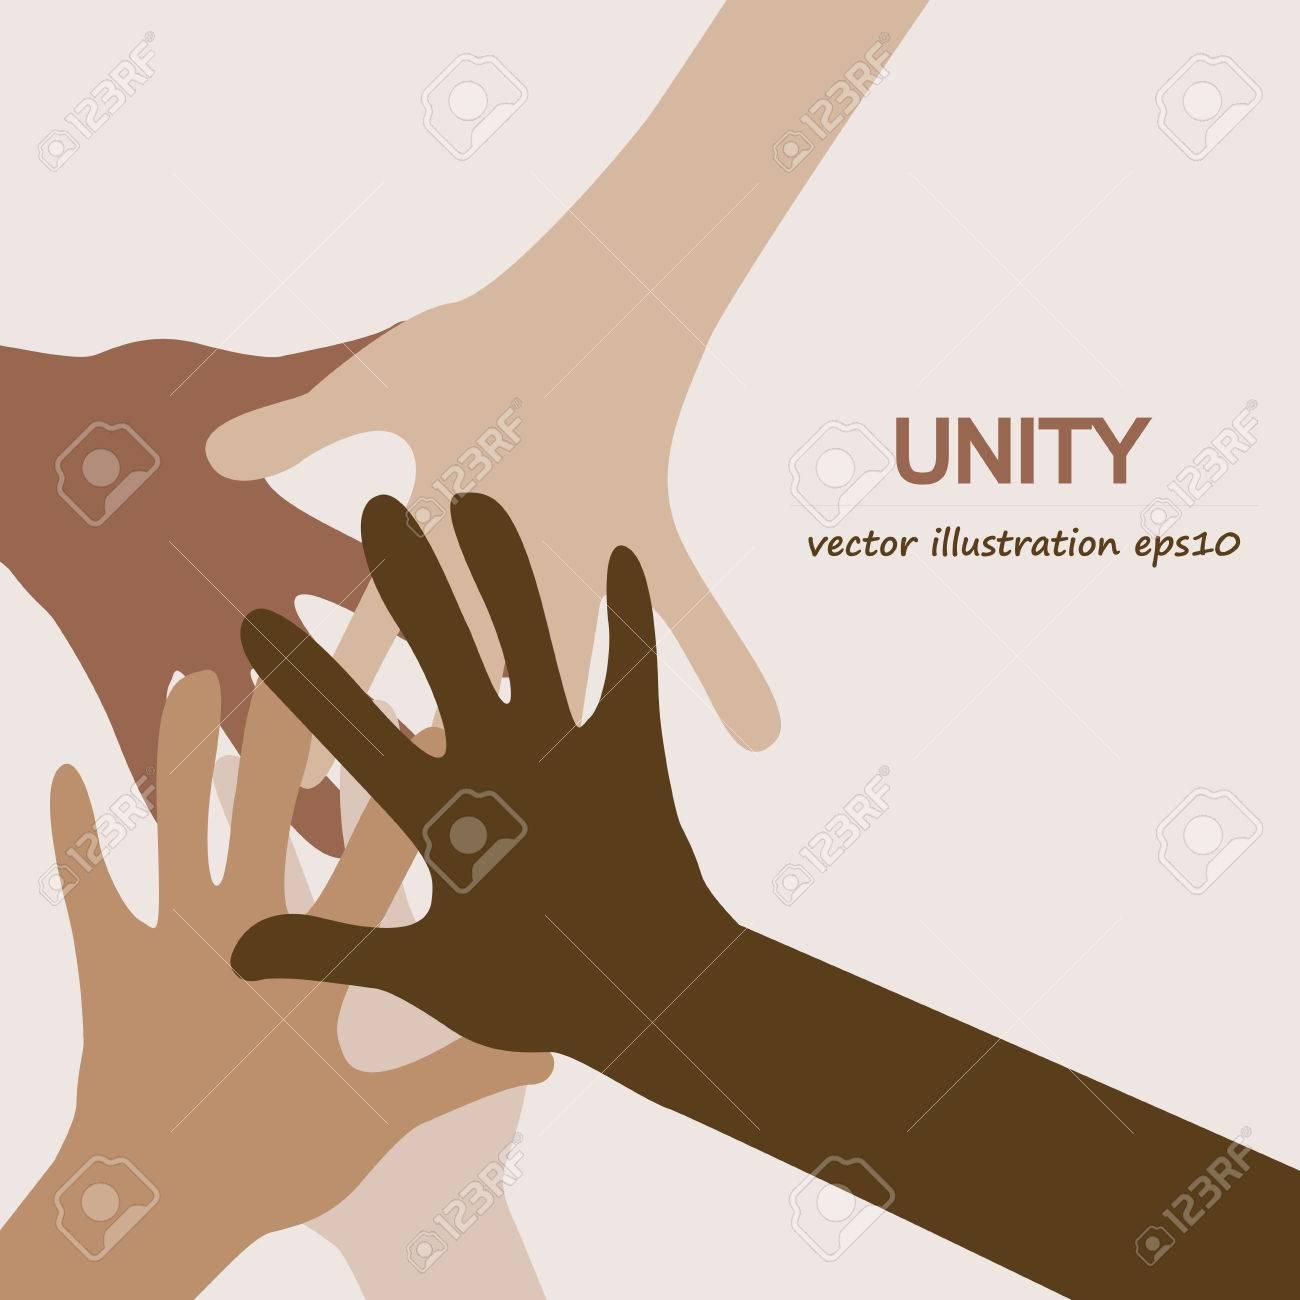 hands diverse unity background - 55453752